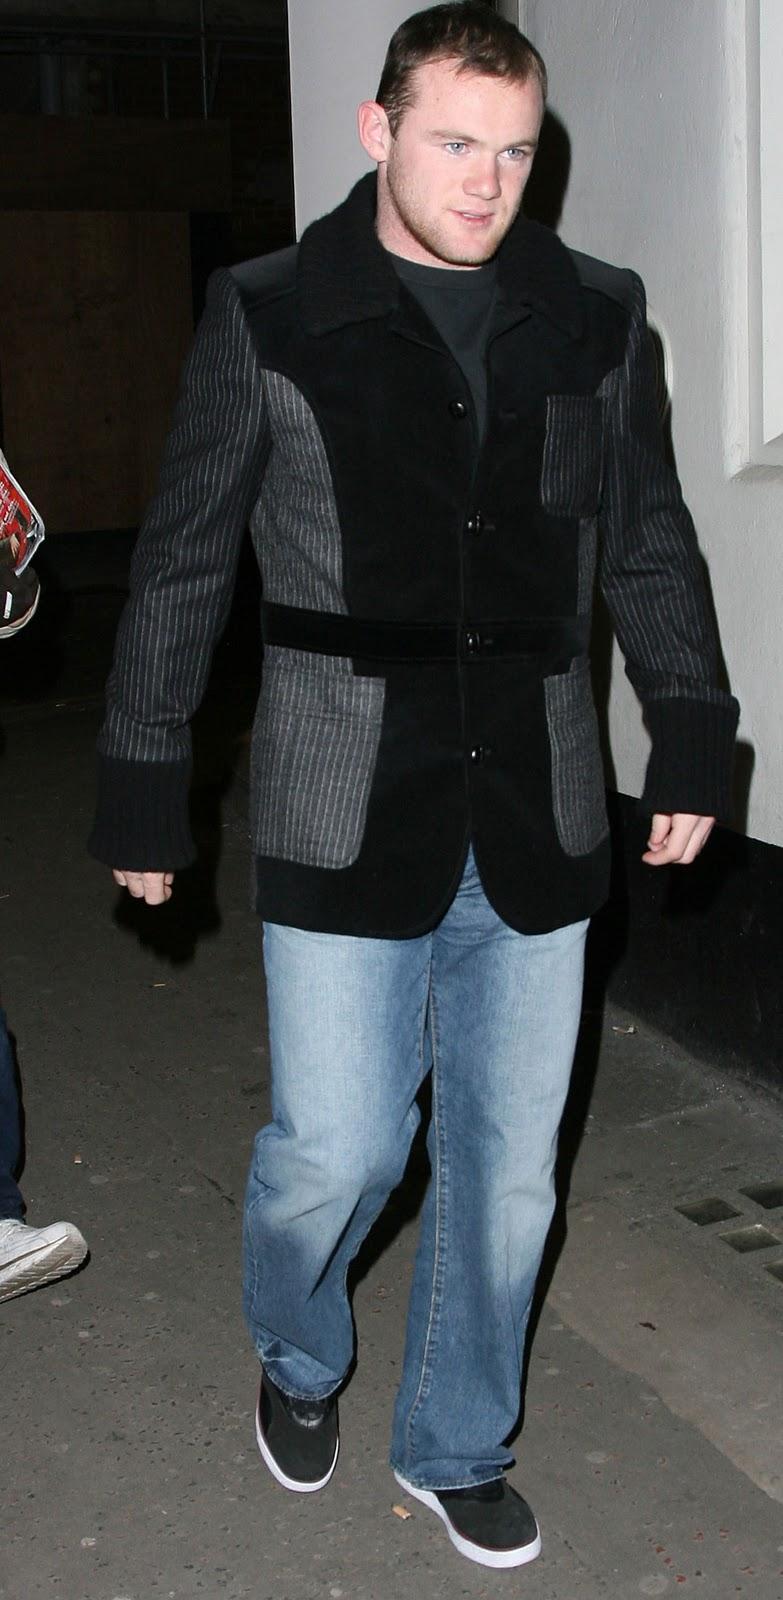 Wayne Rooney Jacket